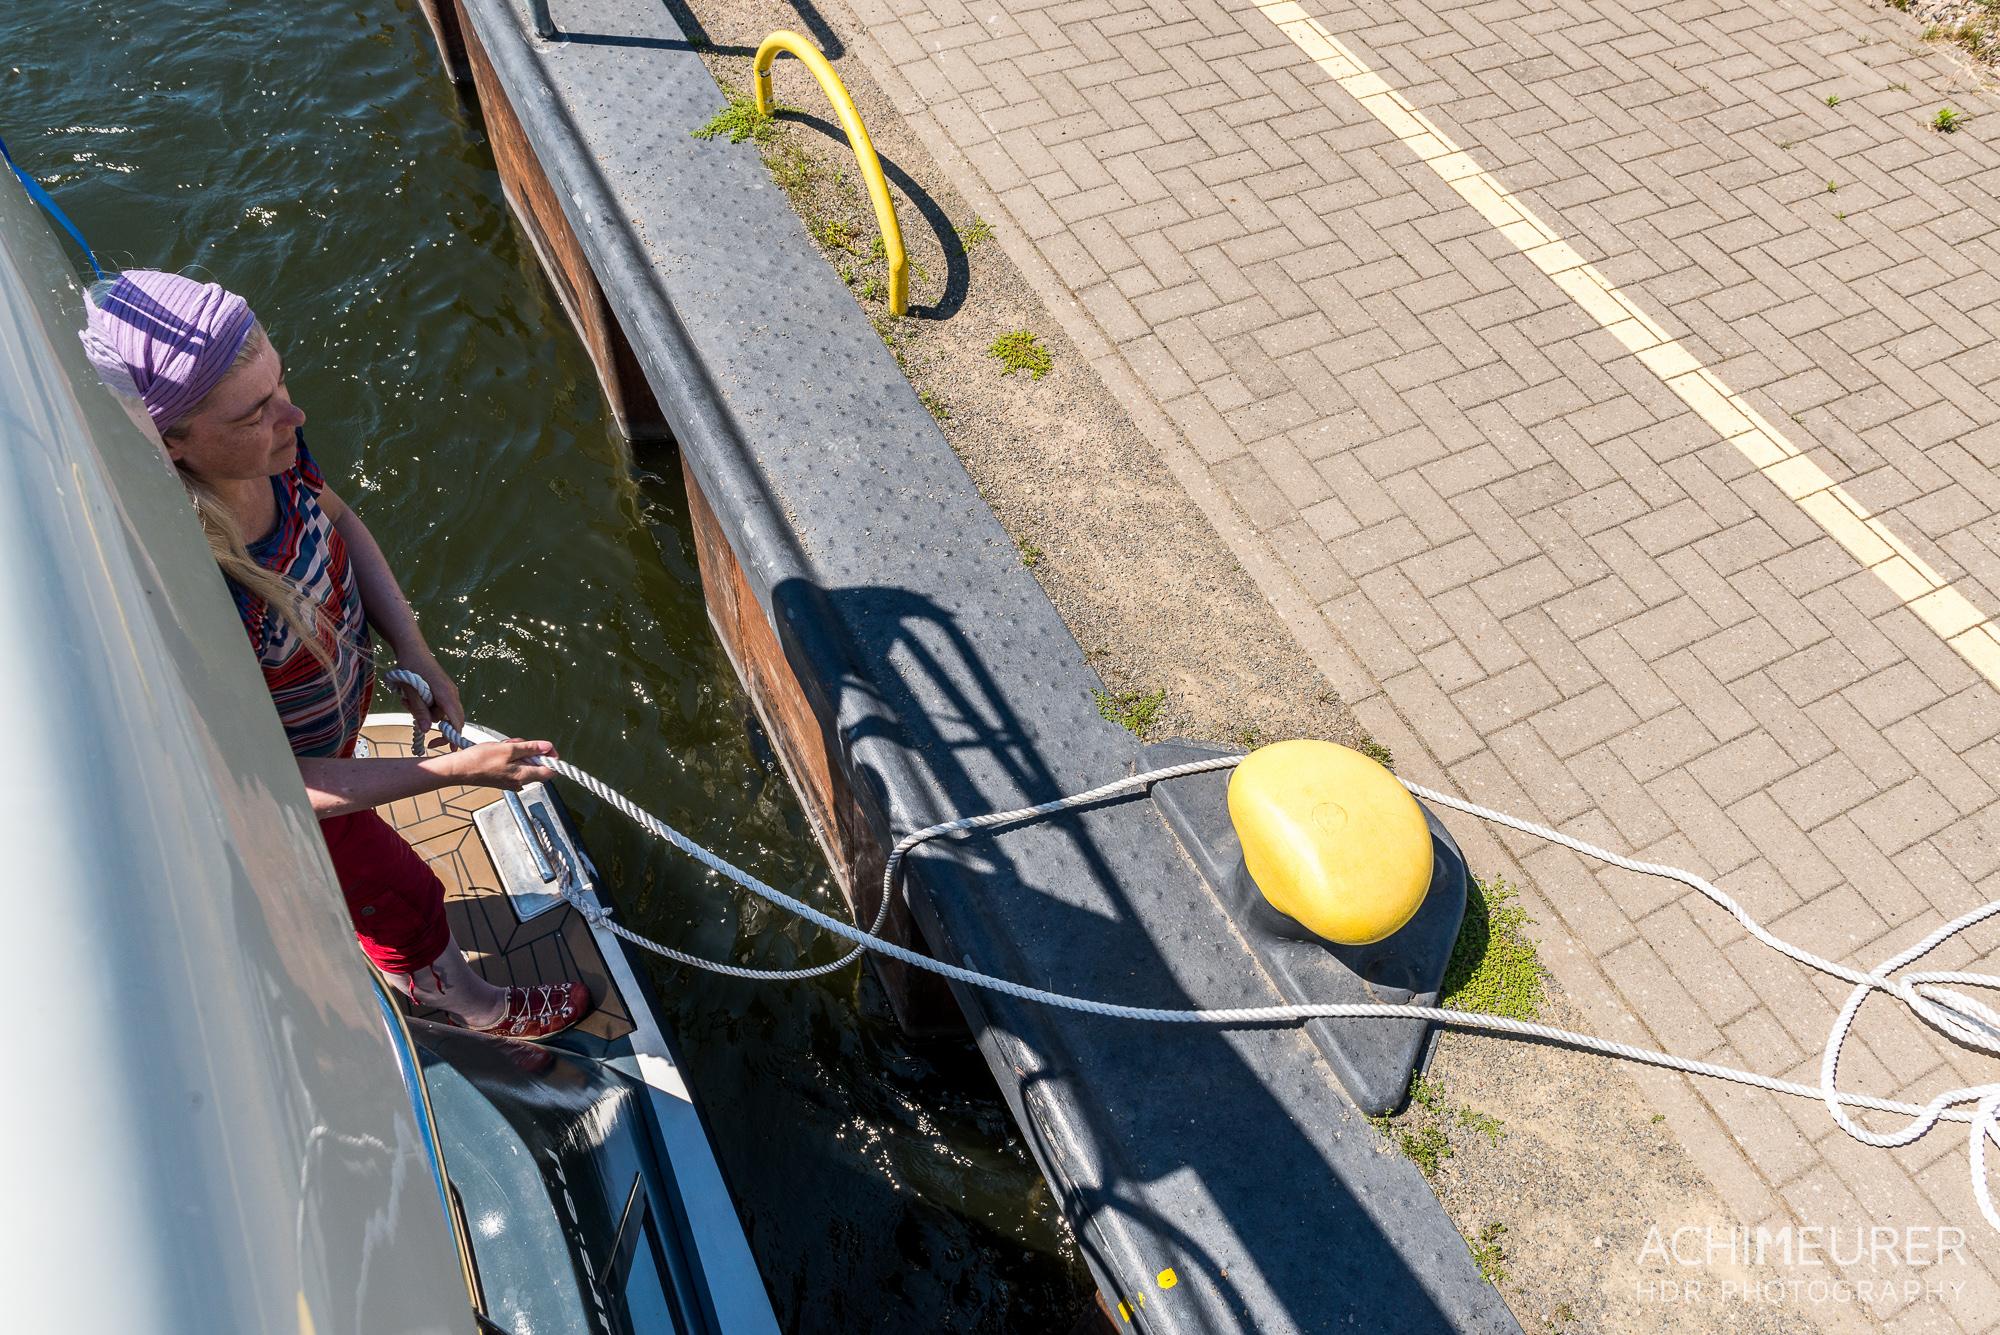 Hausboot-Kuhnle-Mueritz-Mecklenburg-Vorpommern-See_3191